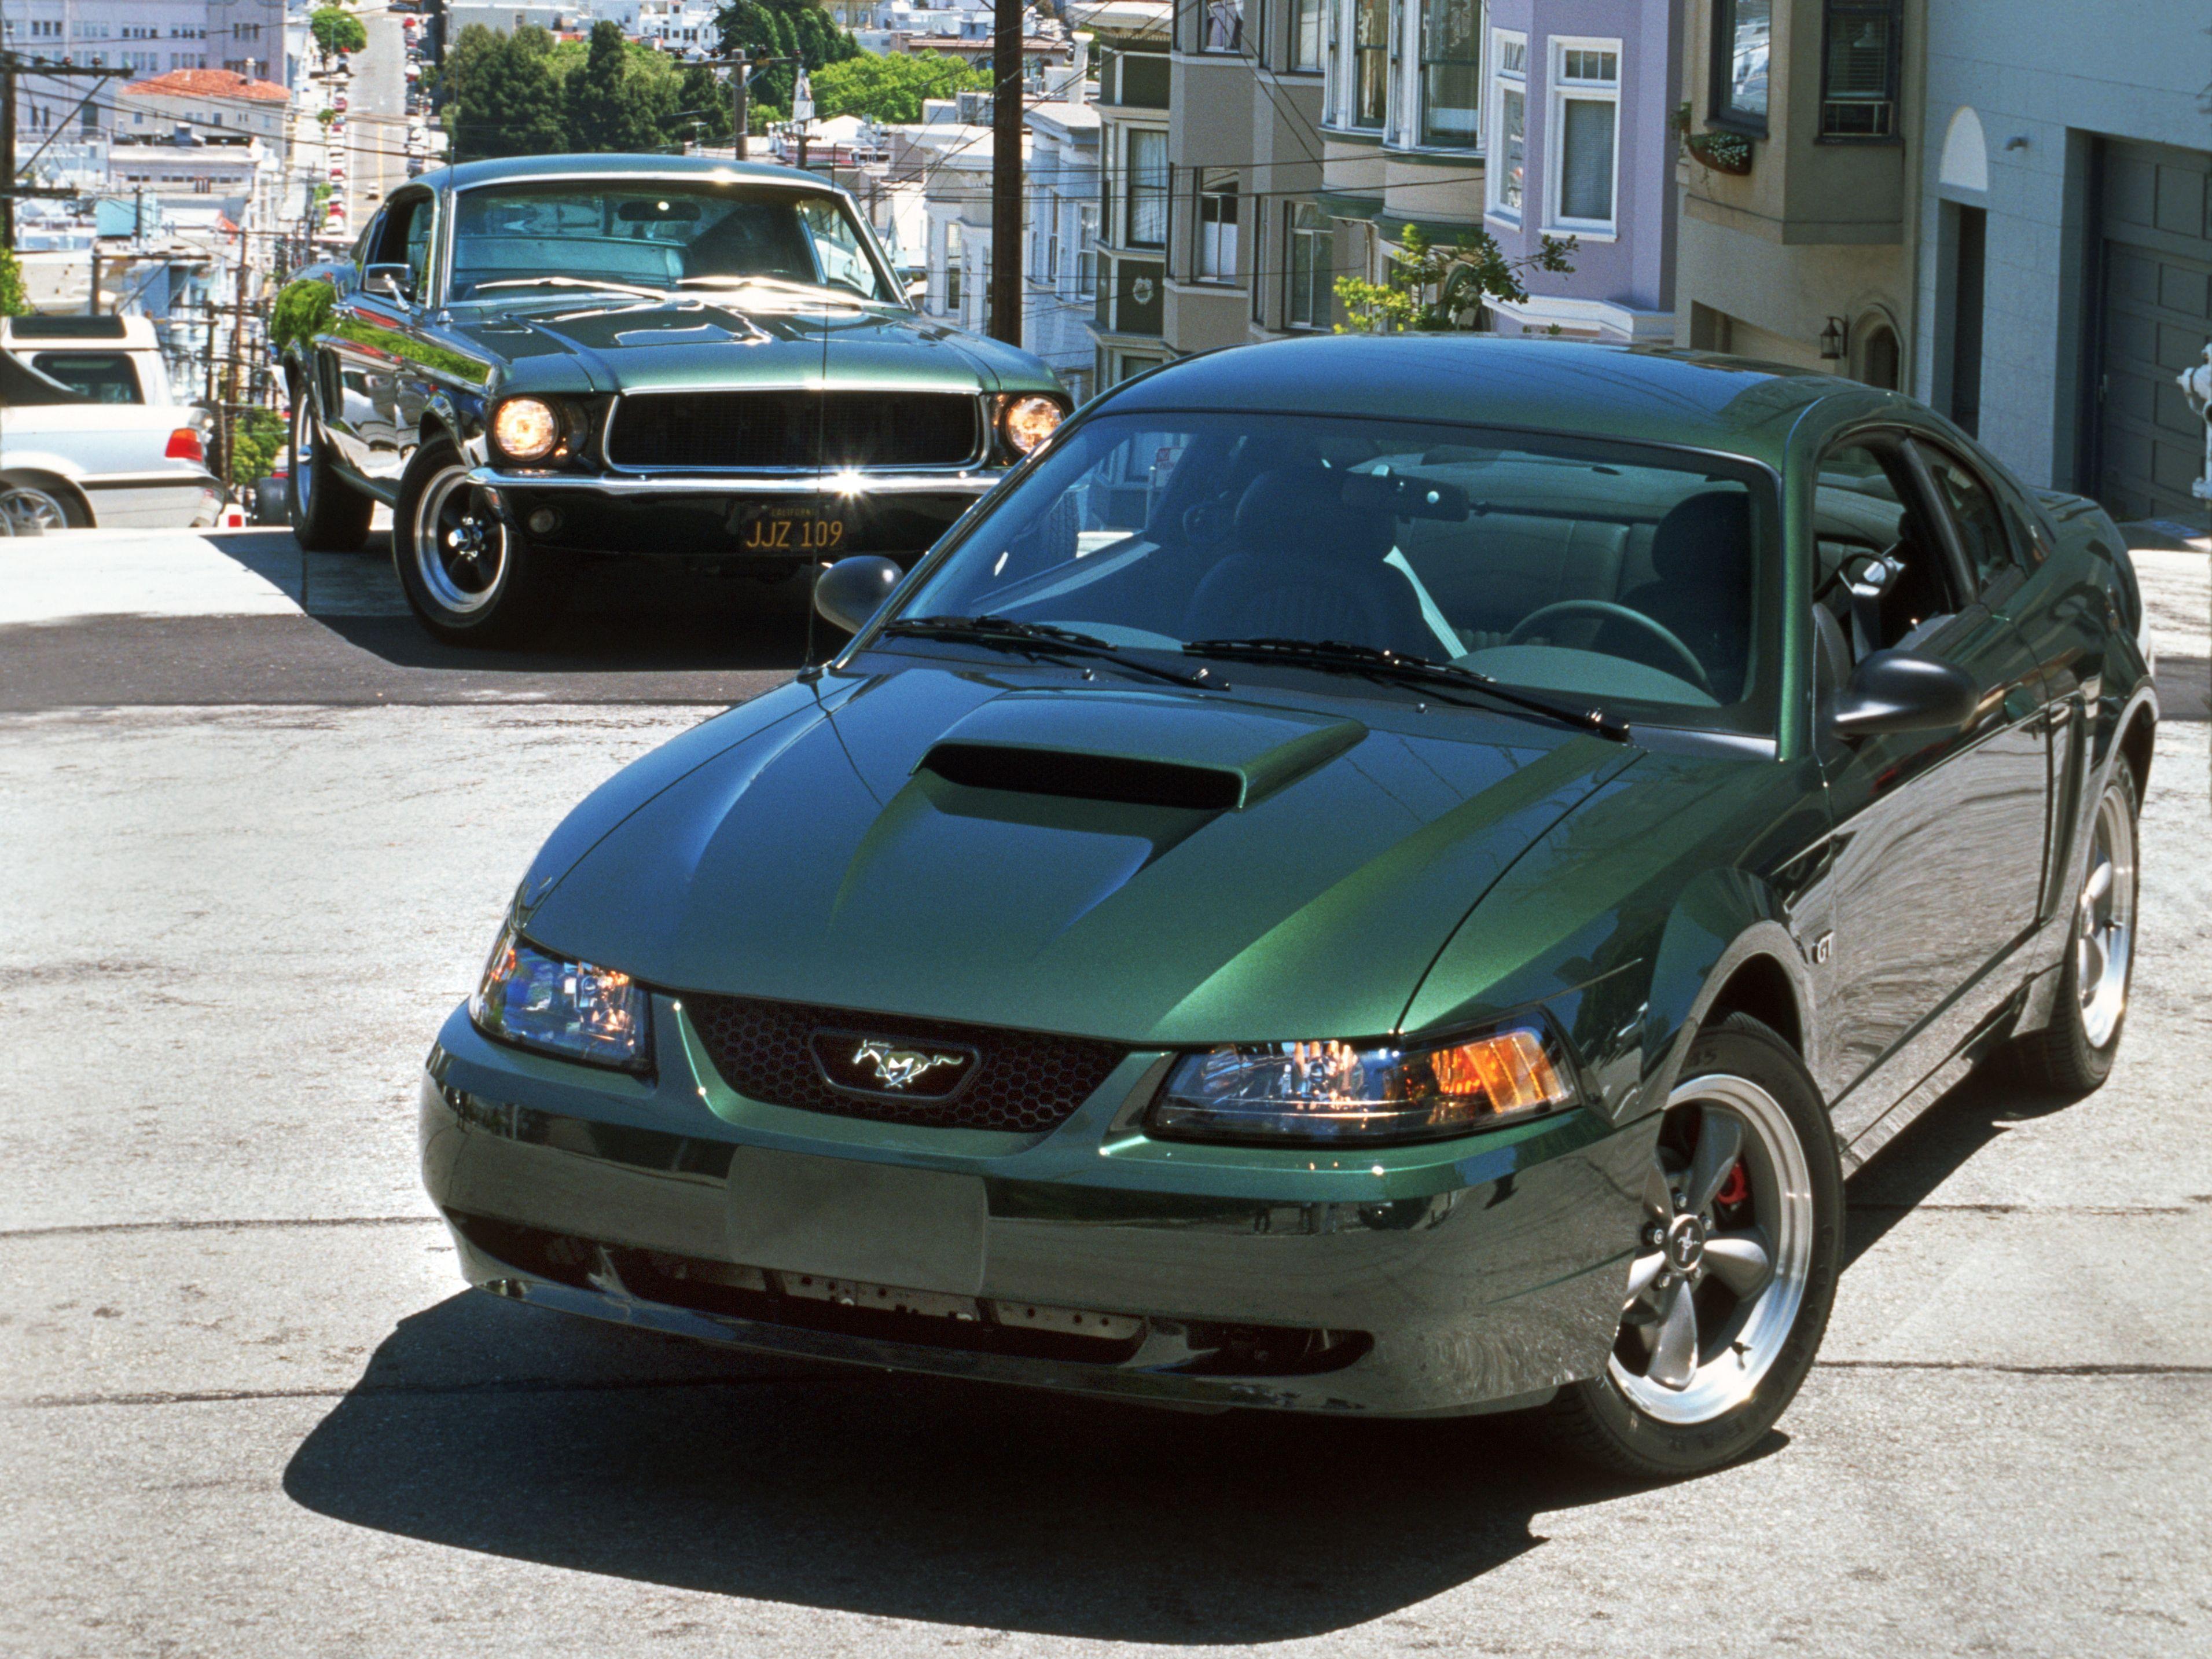 Vehicles ford mustang Wallpaper Mustang